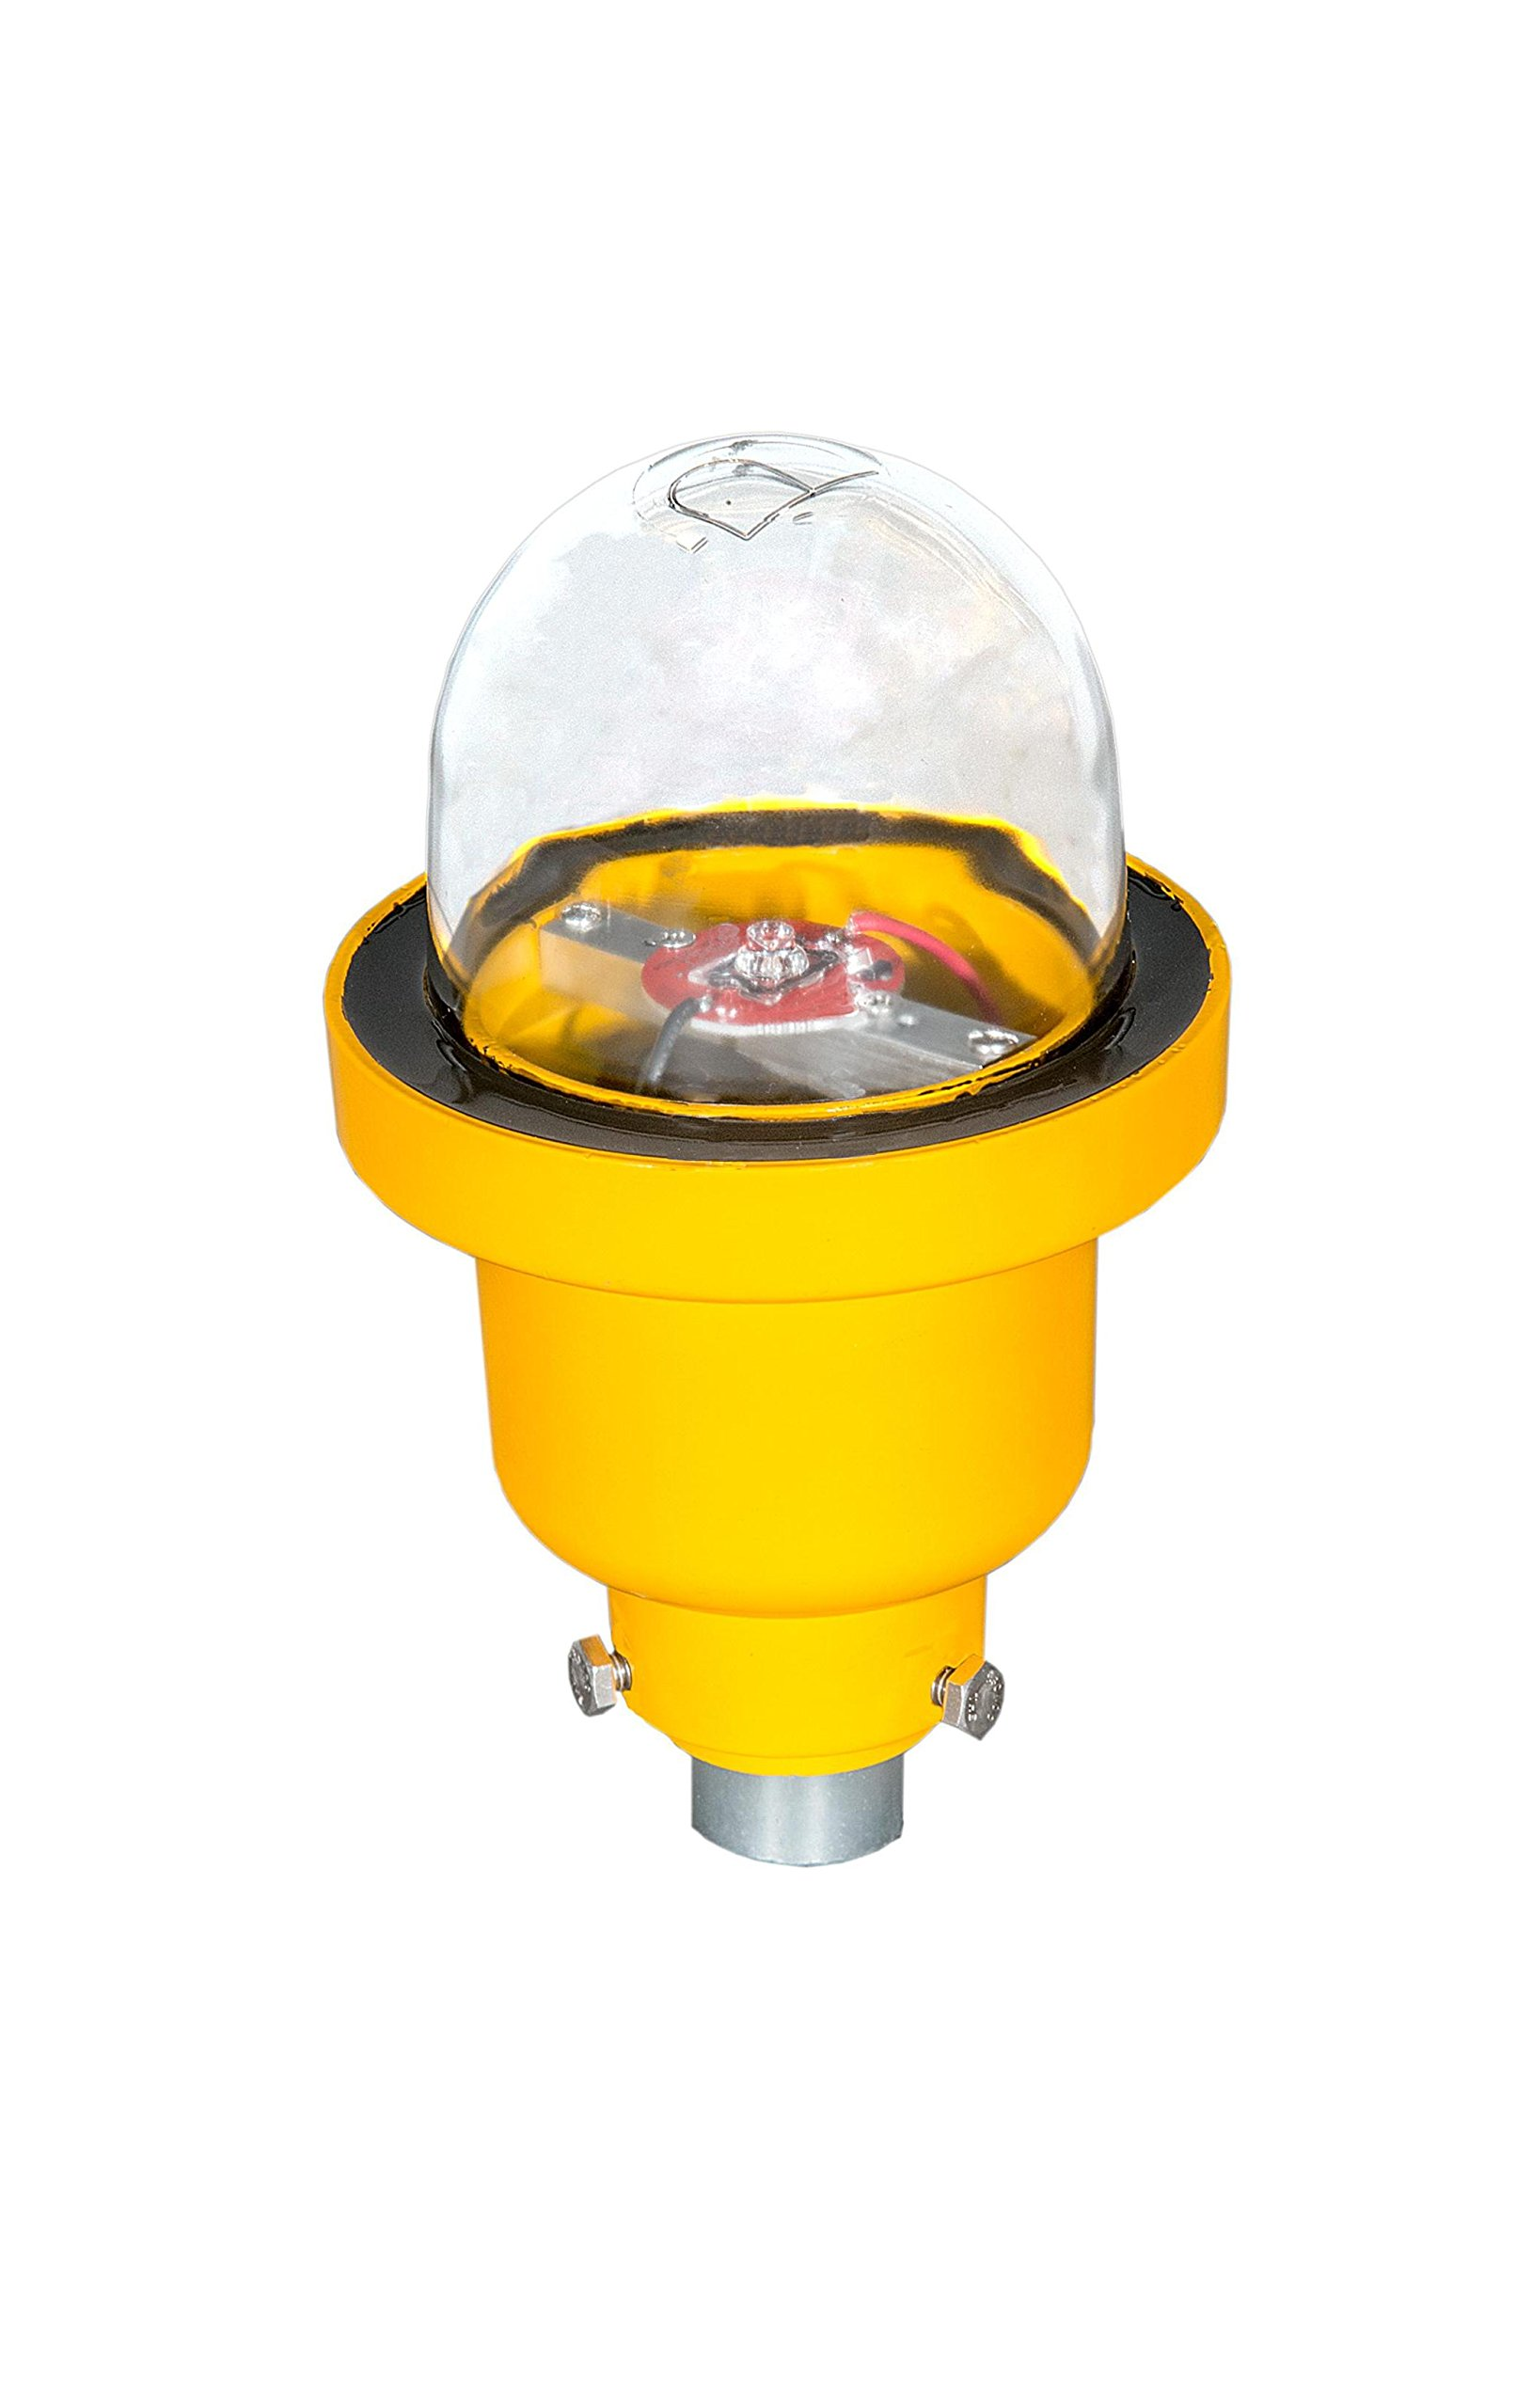 Single LED FAA L-810 Steady-Burning Obstruction Light, Red, 96-250V AC